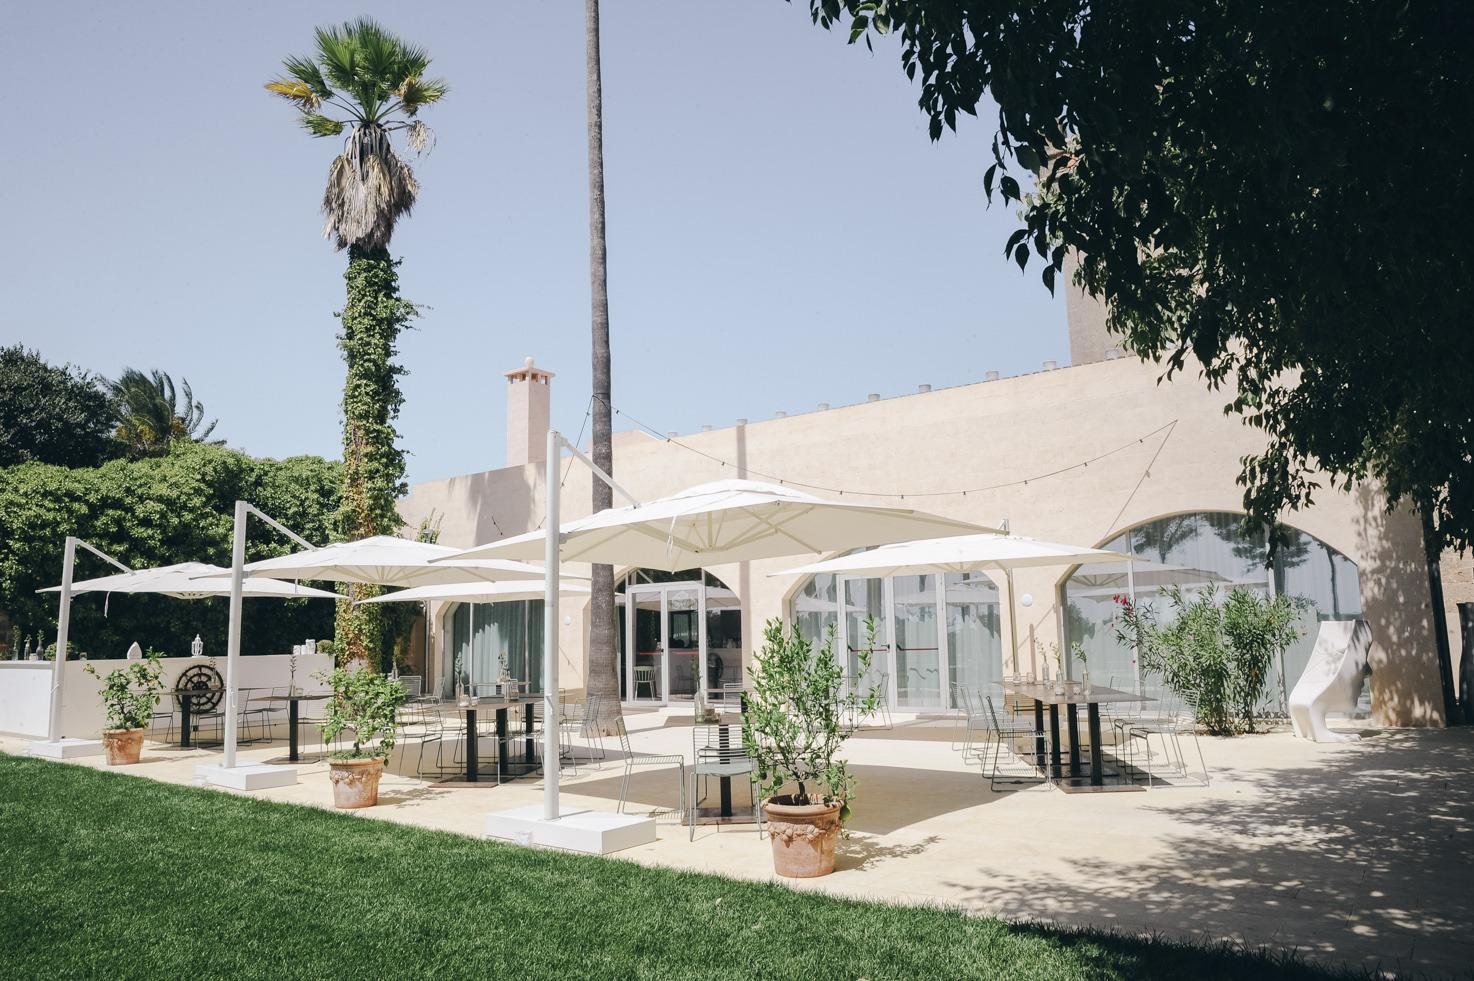 Outdoor restaurant at Vinilia Wine Resort